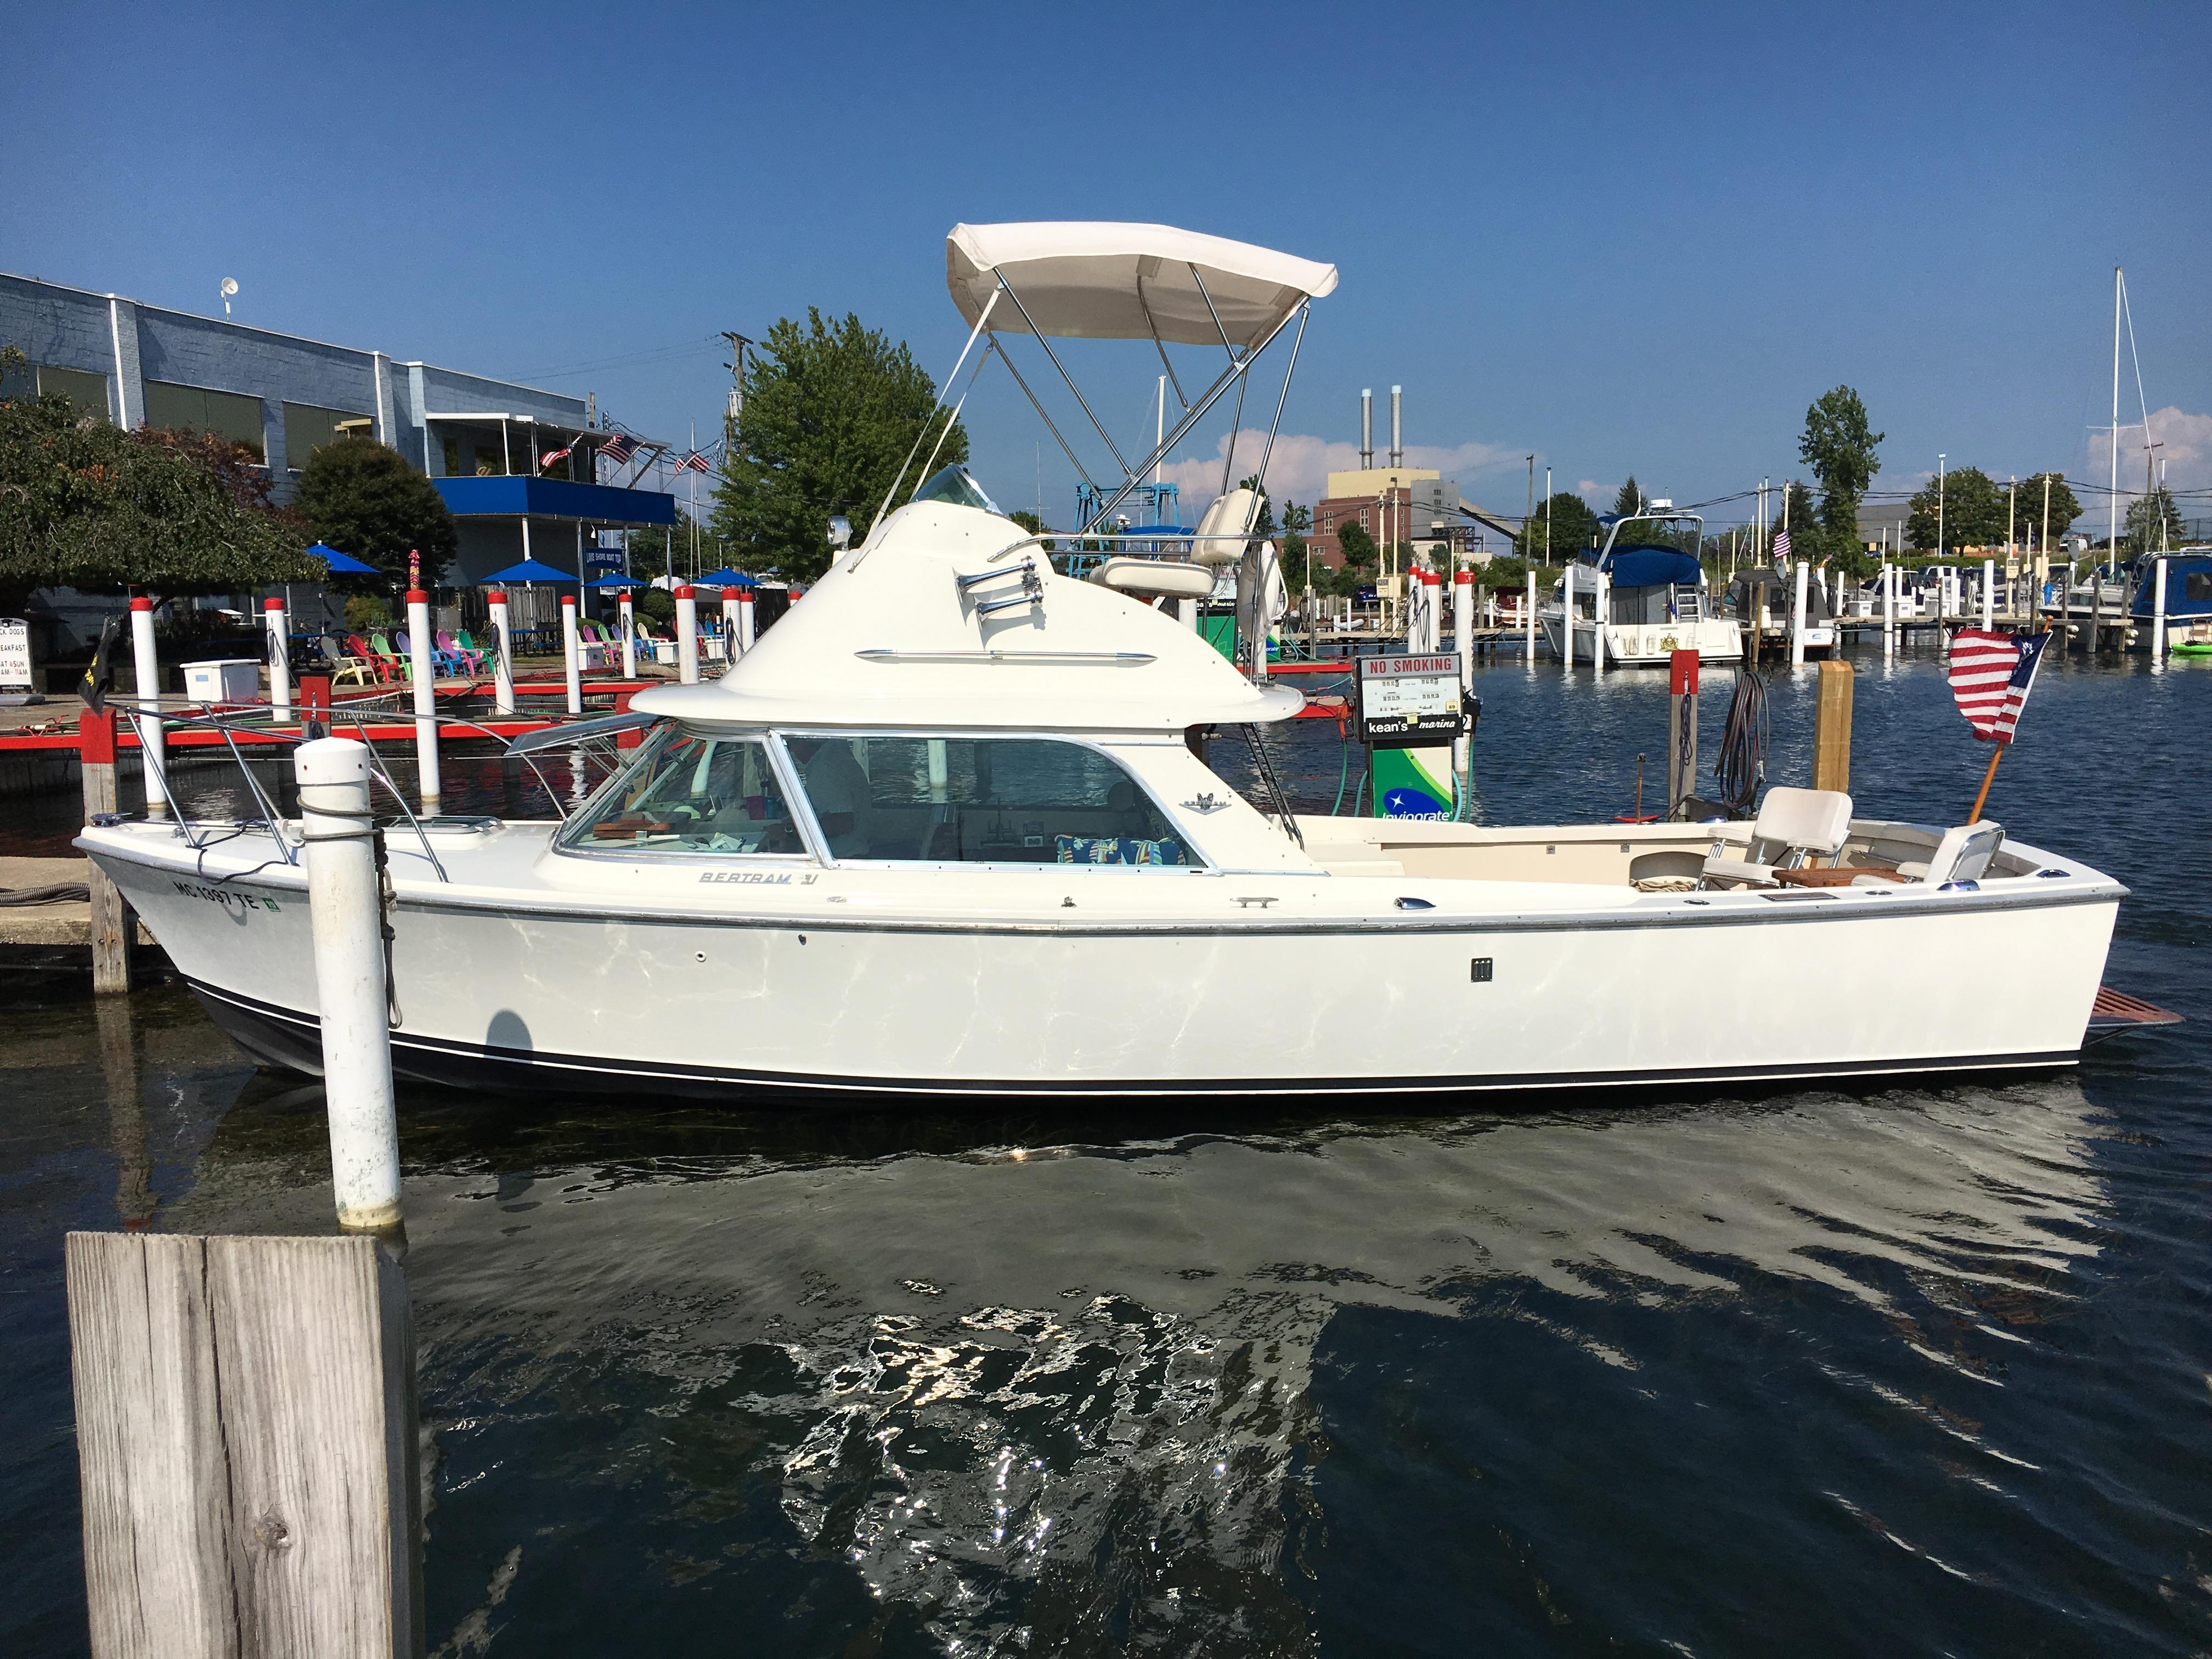 1972 Bertram 31 Sportfish Power Boat For Sale Wwwyachtworldcom